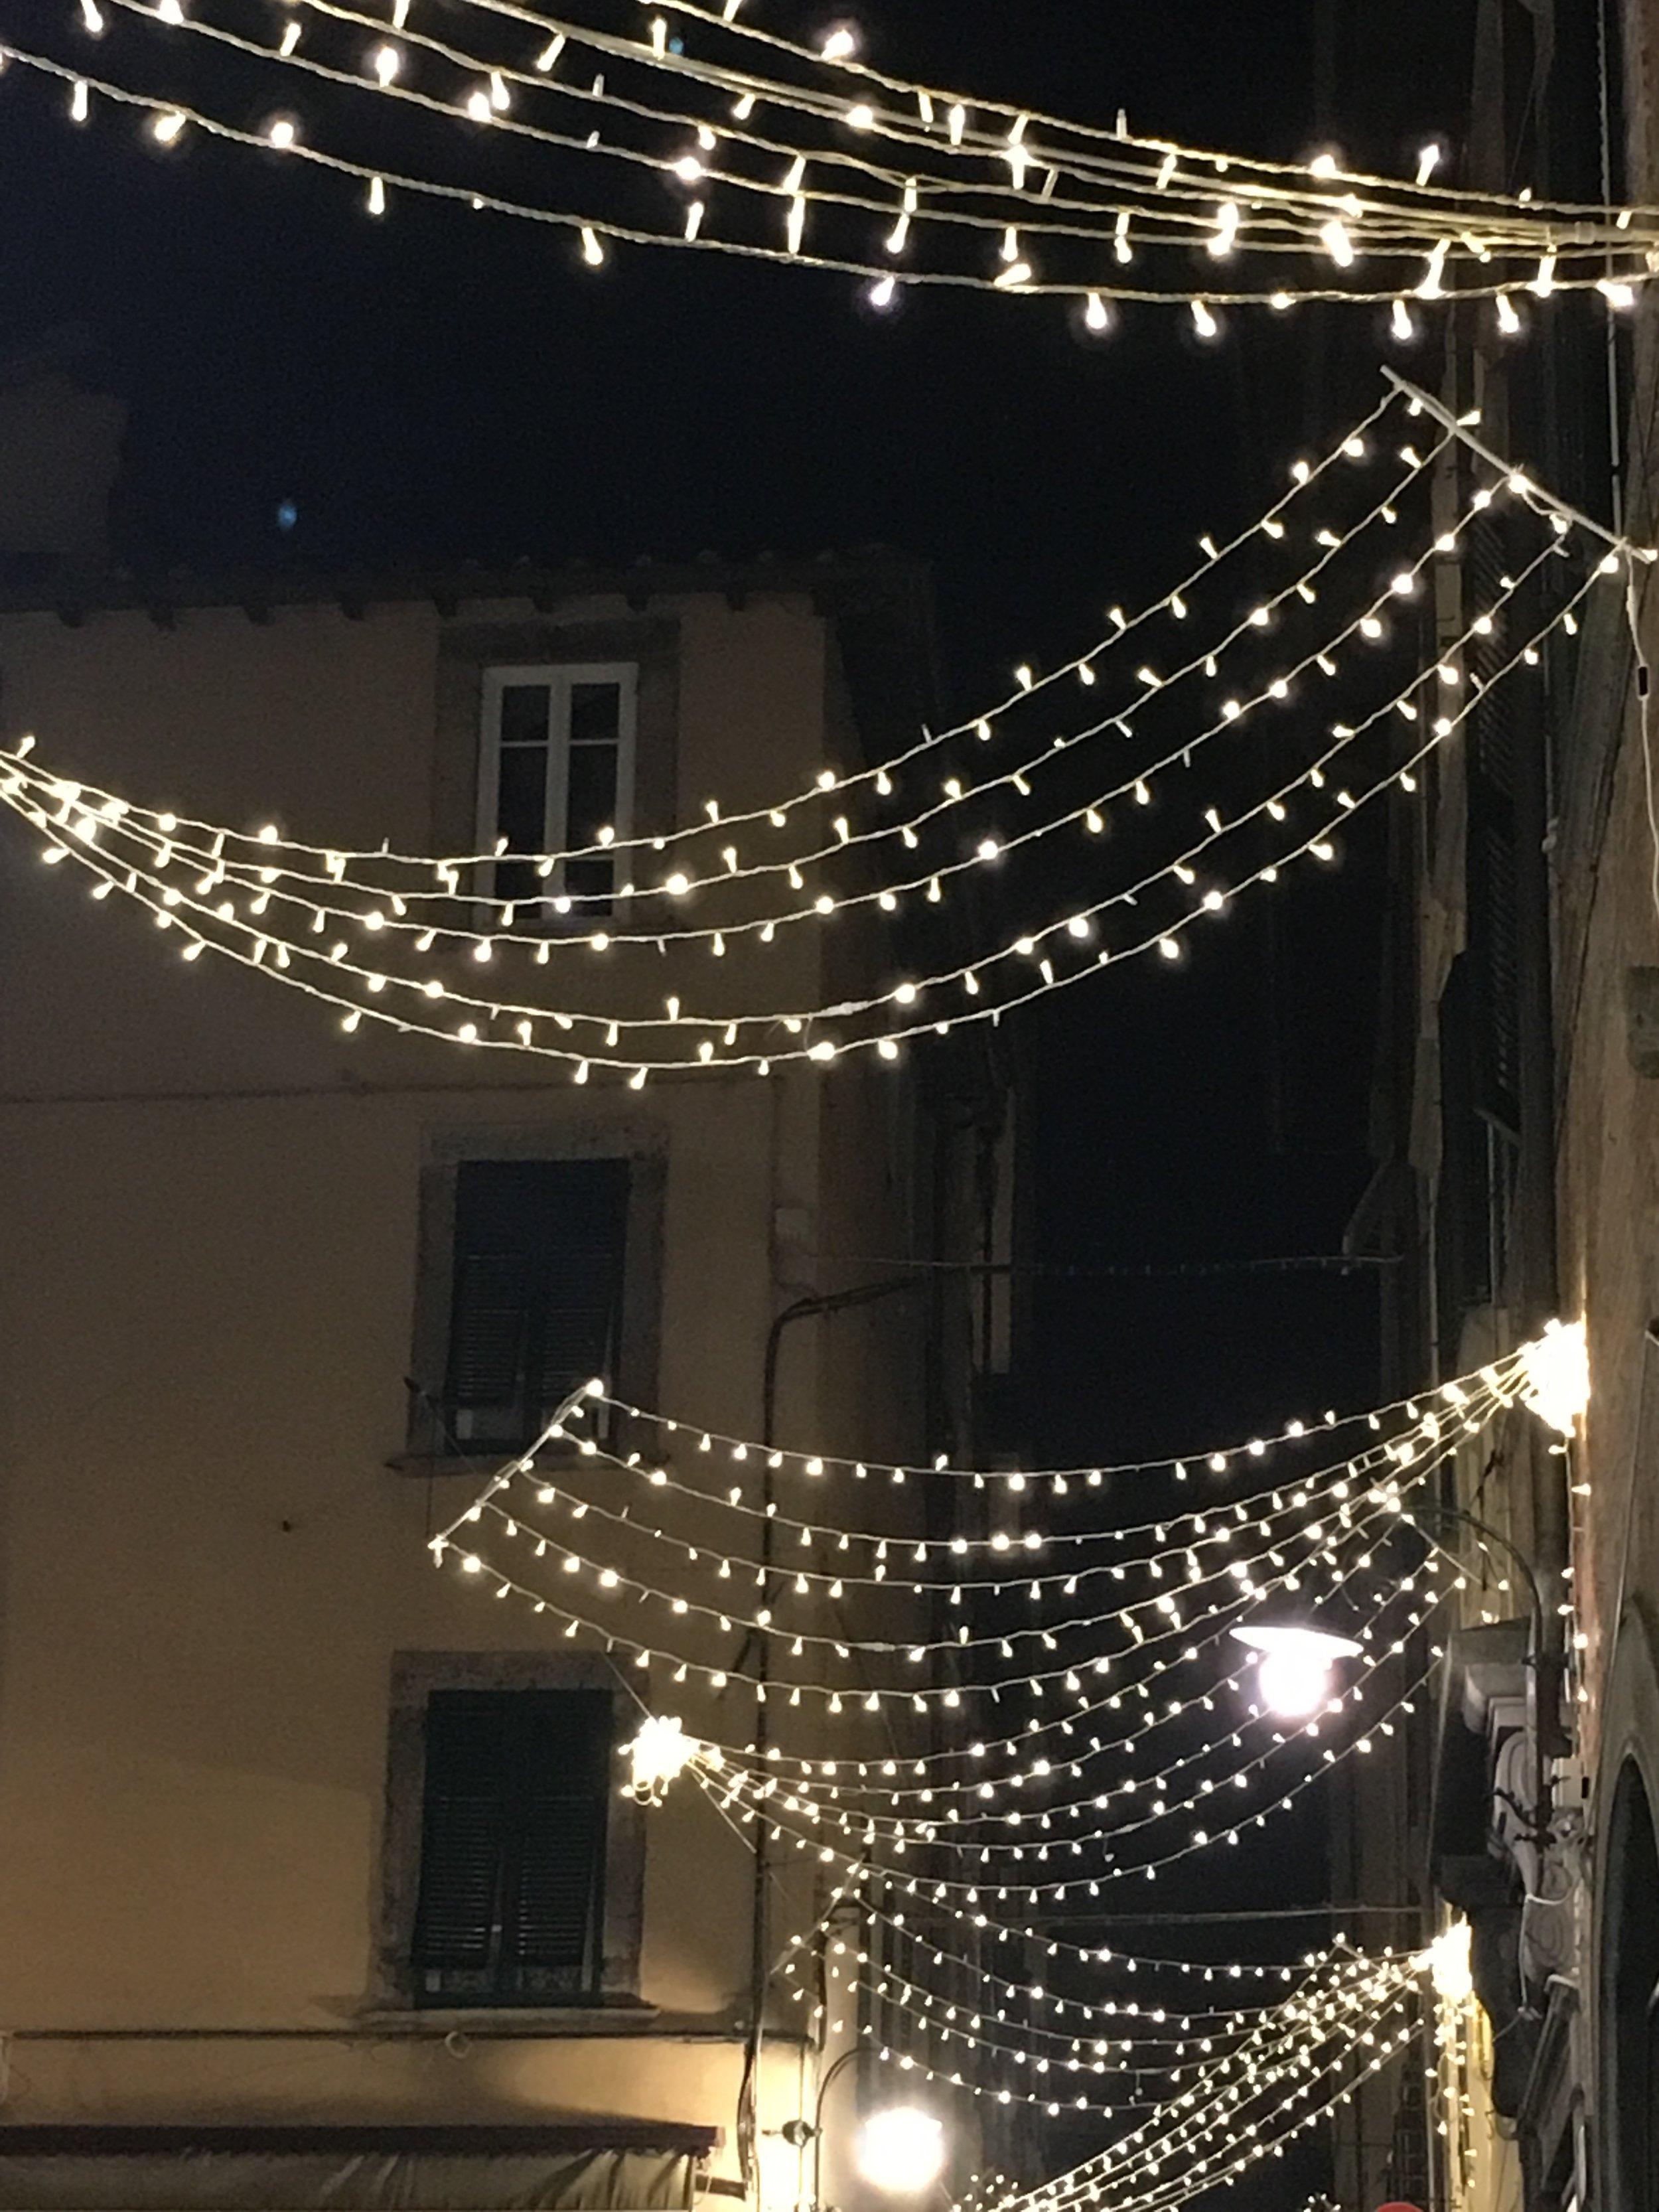 Rows of lights crisscross a street in Lucca, December 2016.